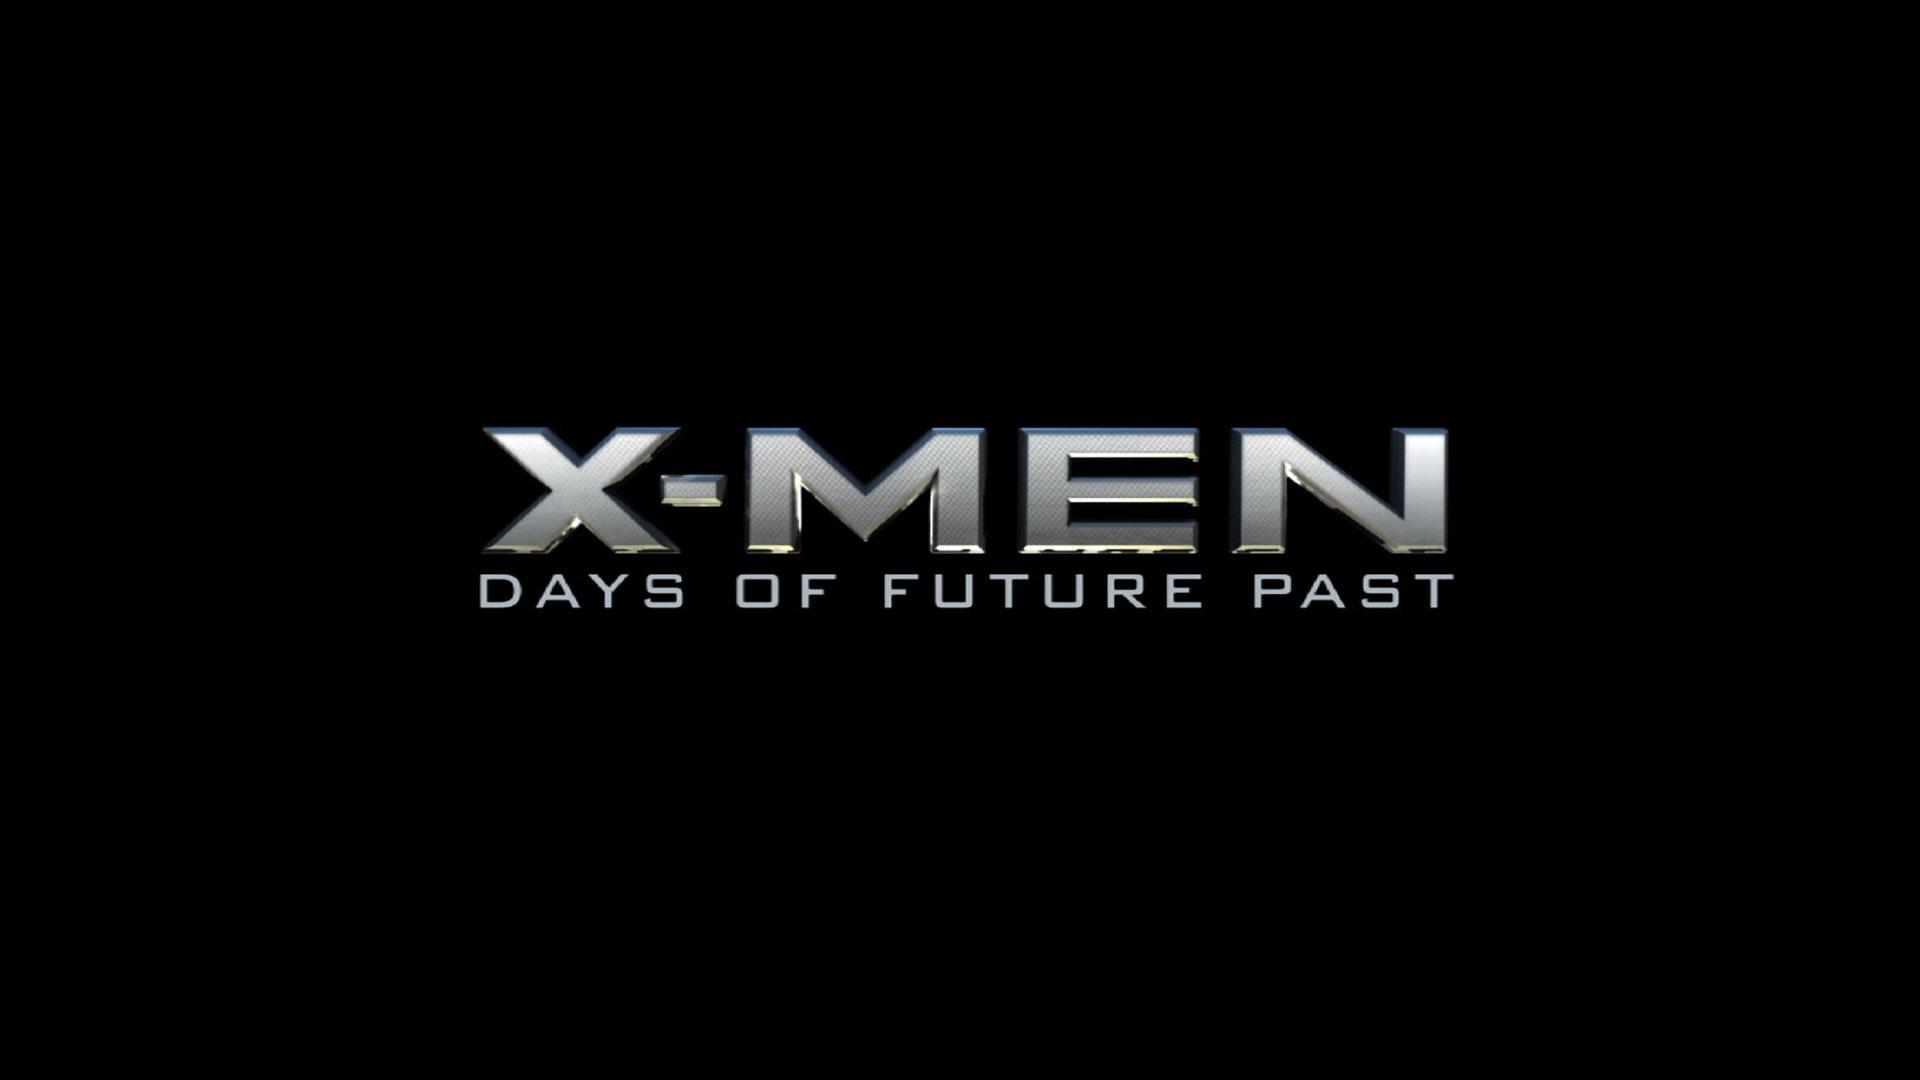 2014 wolverine wallpapers x men days of future past logo wallpaper hd 1920x1080